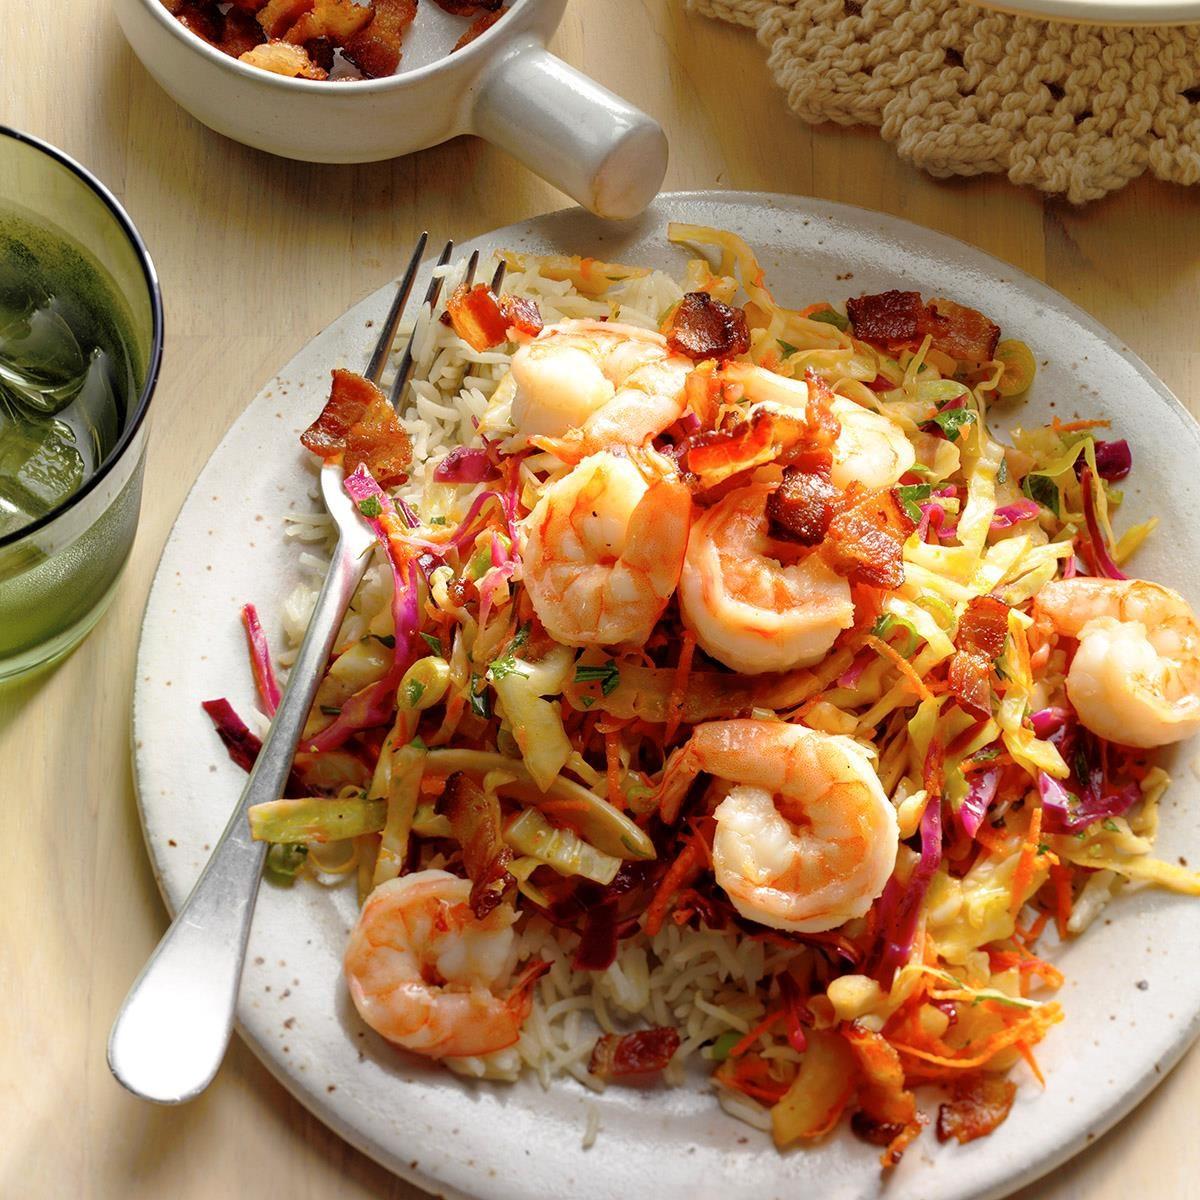 Shrimp With Warm German Style Coleslaw  Exps Thn17 204062 B06 21 3b 4